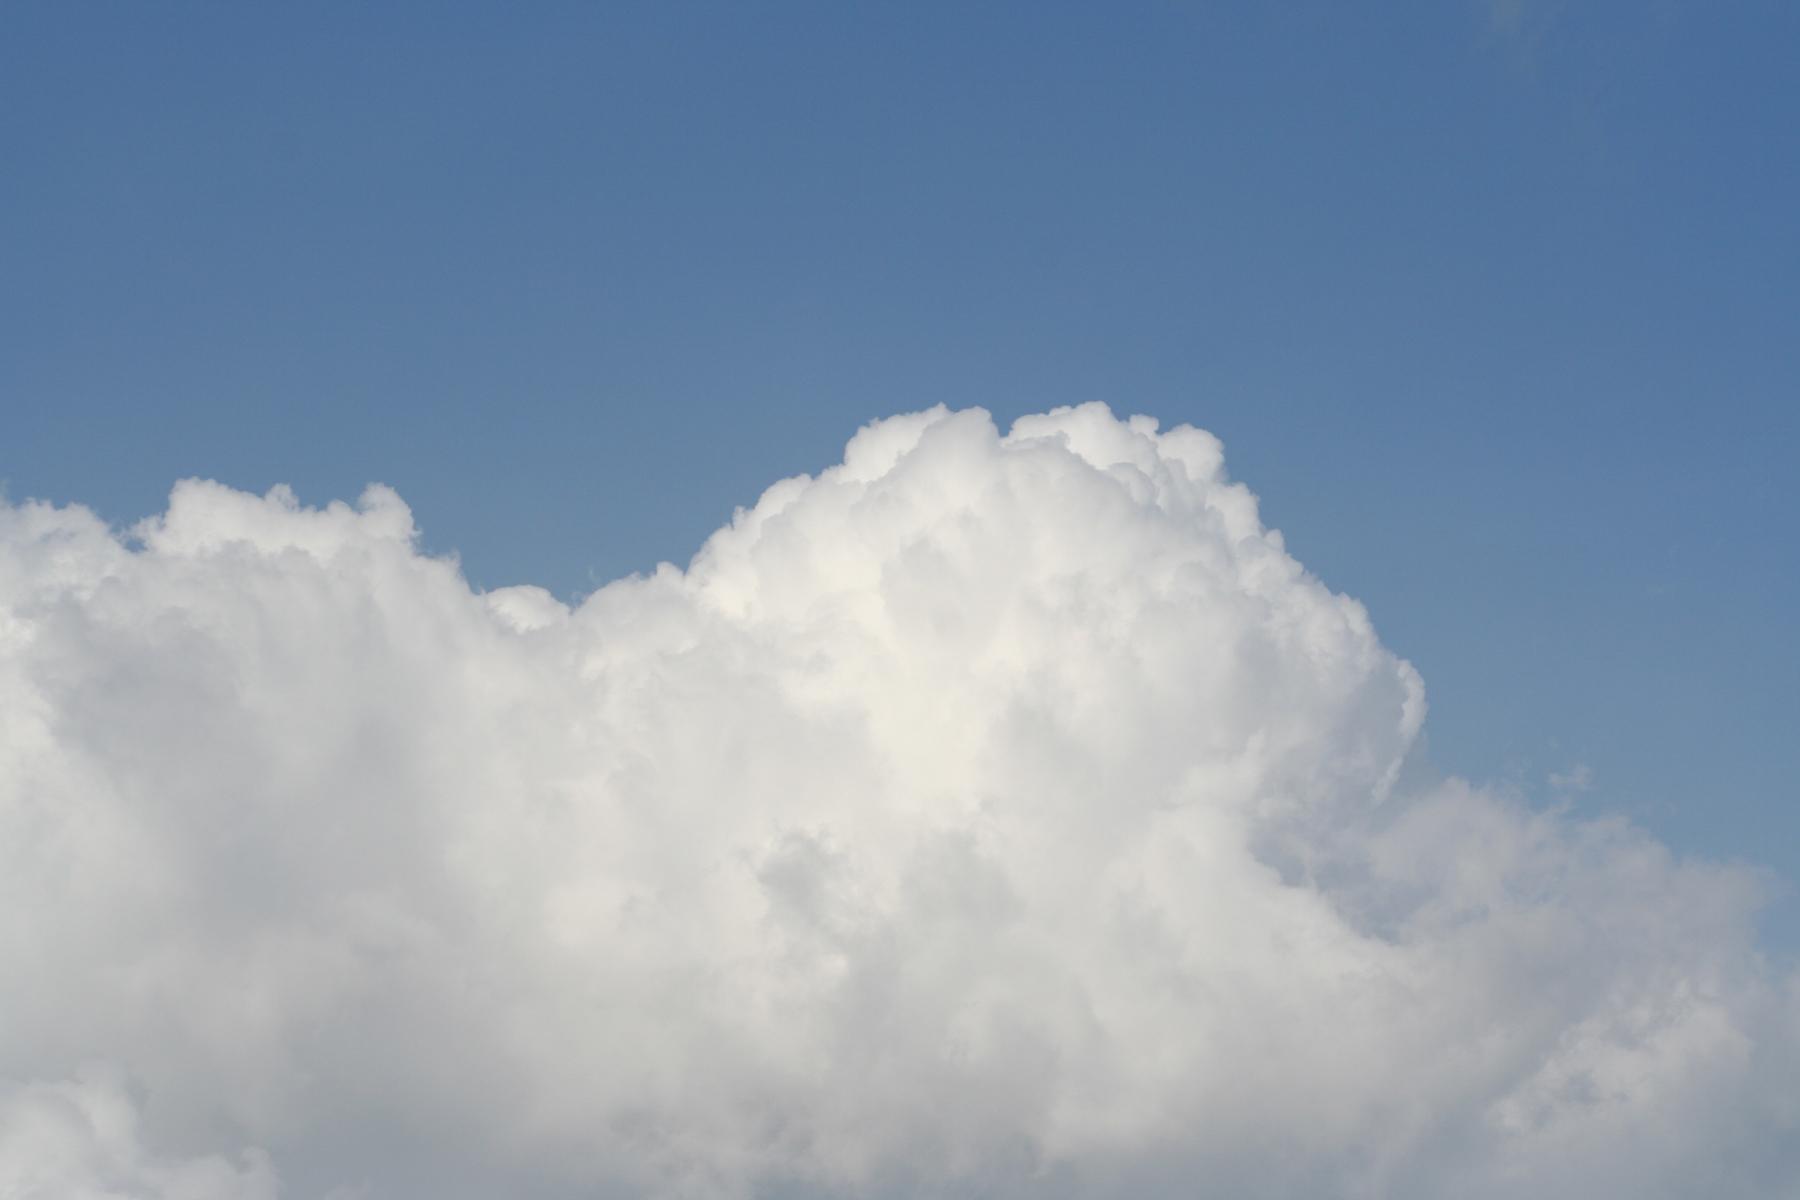 Clouds, Blue, Heaven, Sky, White, HQ Photo